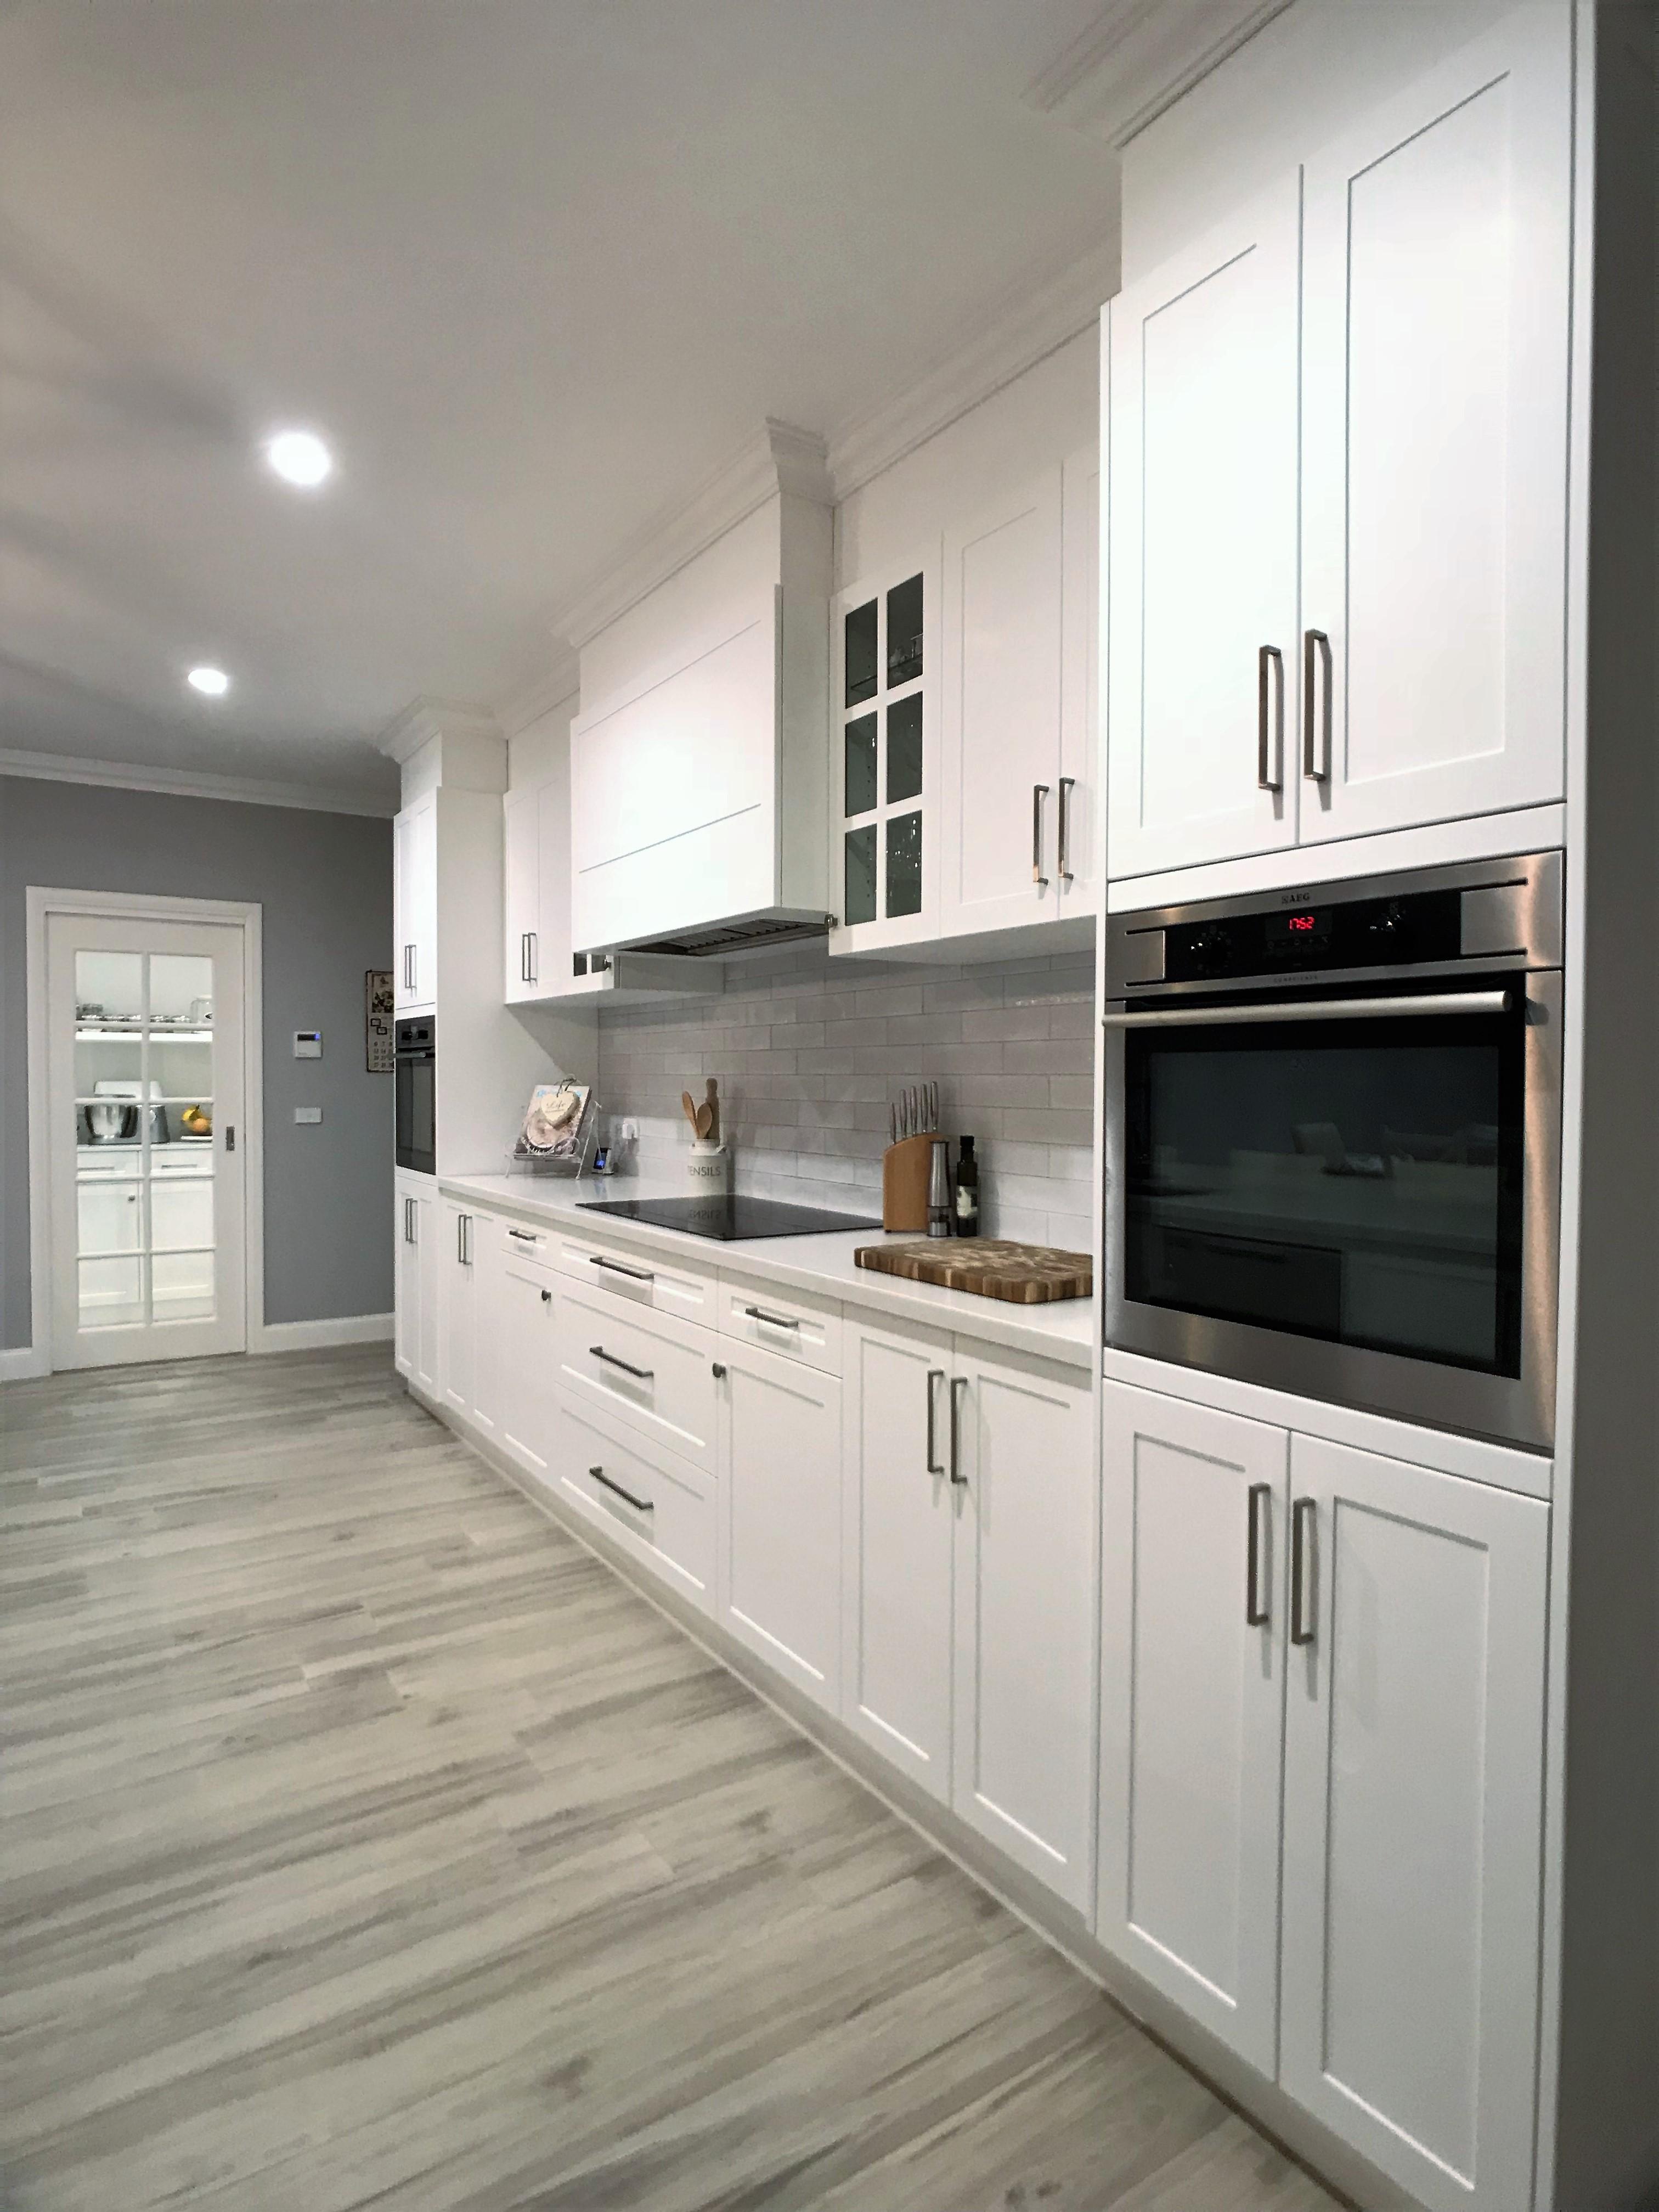 Stylish kitchen with white benchtops and stylish oven.